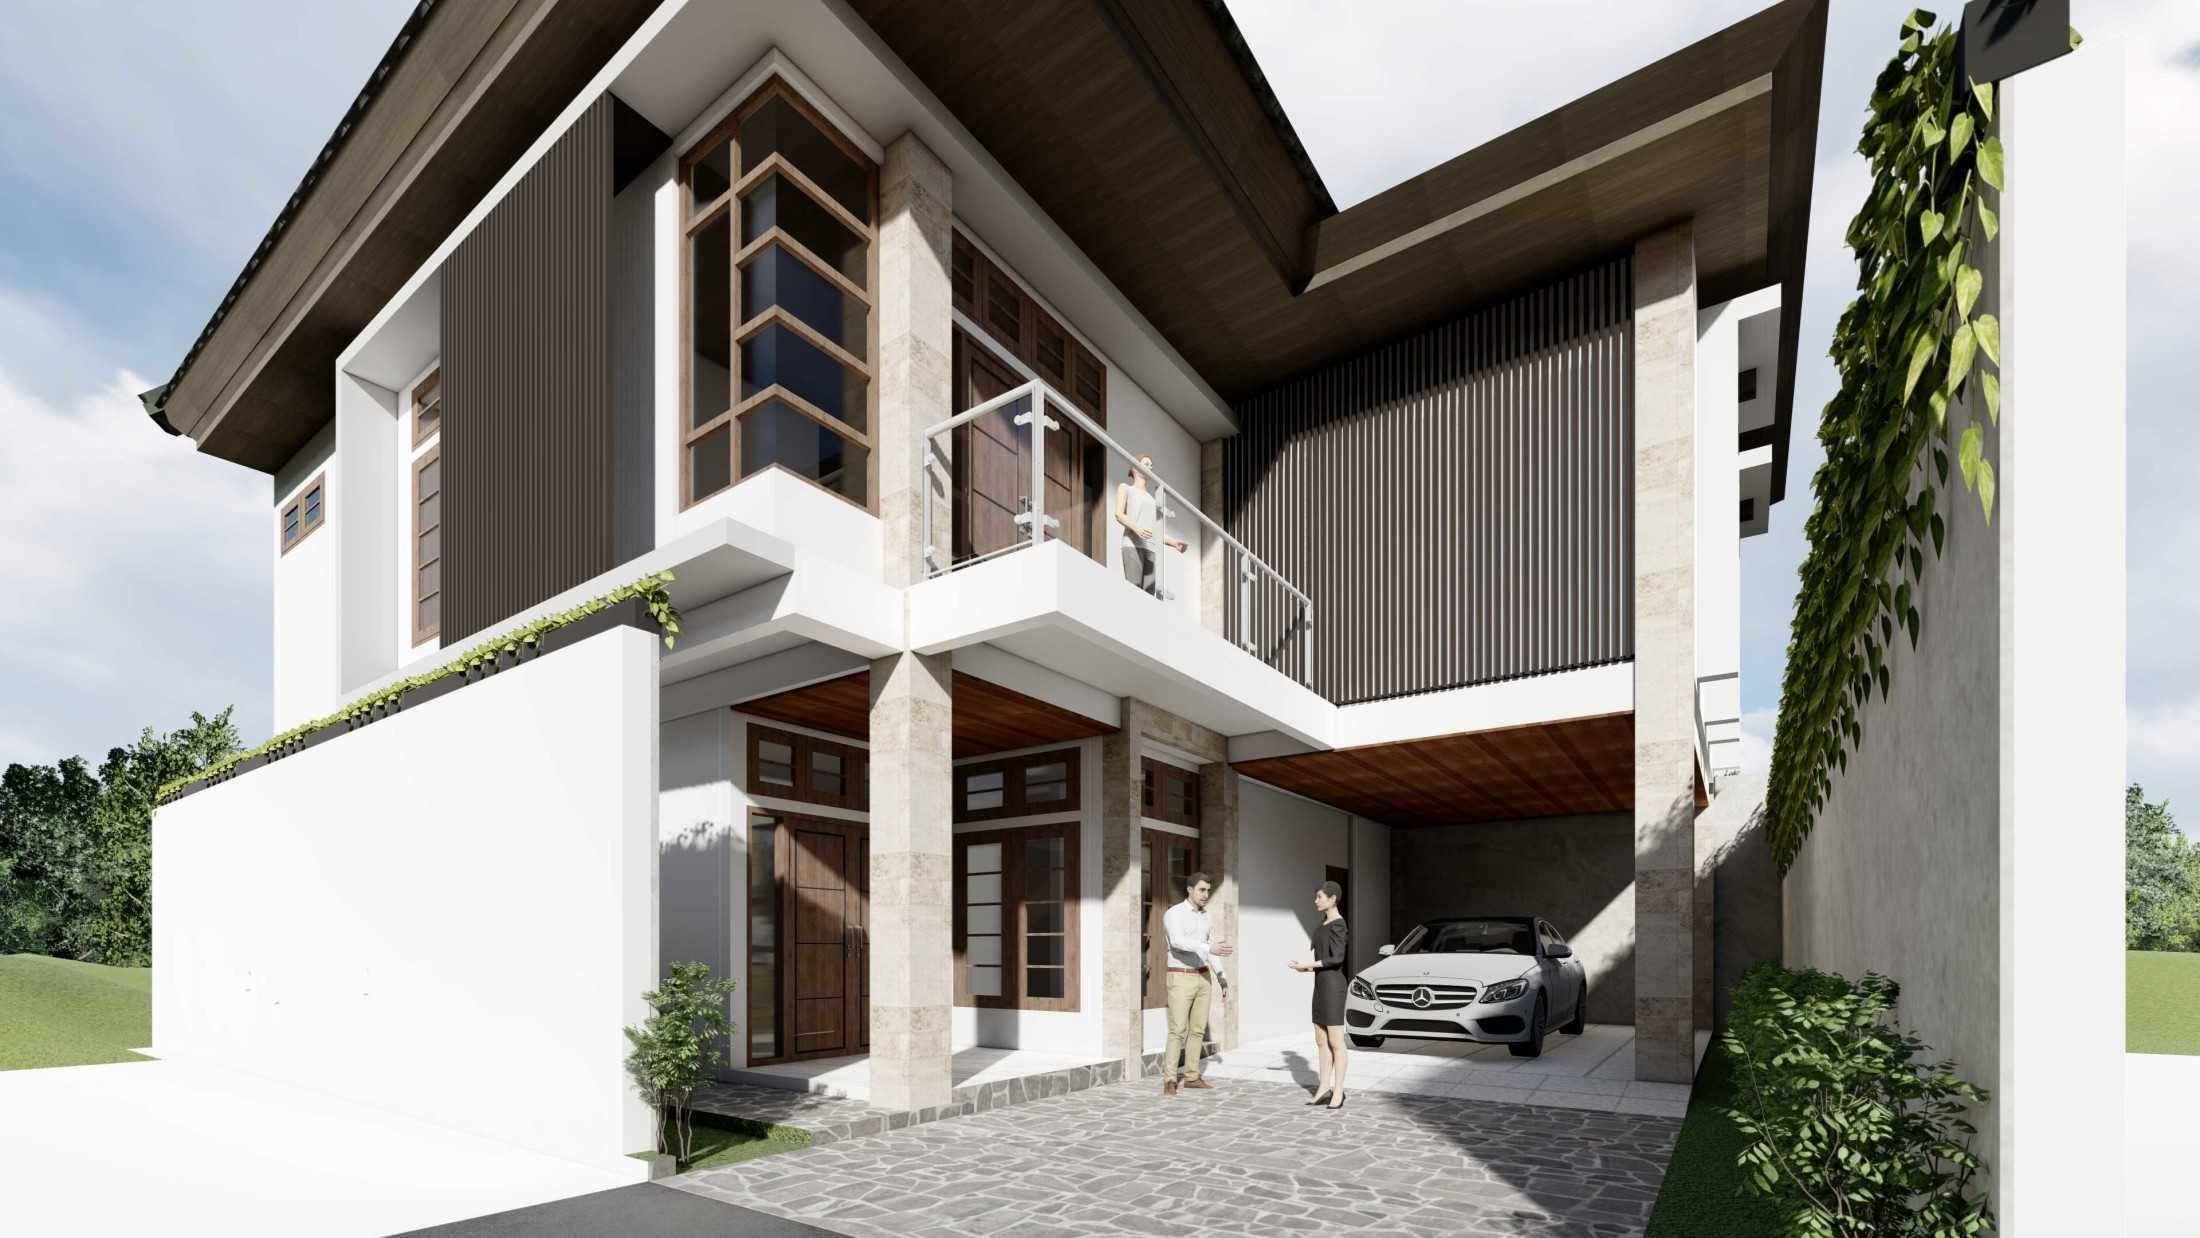 Astabumi Studio Js House Timor Leste Dili, Timor-Leste Pati, Kec. Pati, Kabupaten Pati, Jawa Tengah, Indonesia Cv-Astabumi-Manunggal-Prakarsa-Js-House-Timor-Leste  119260